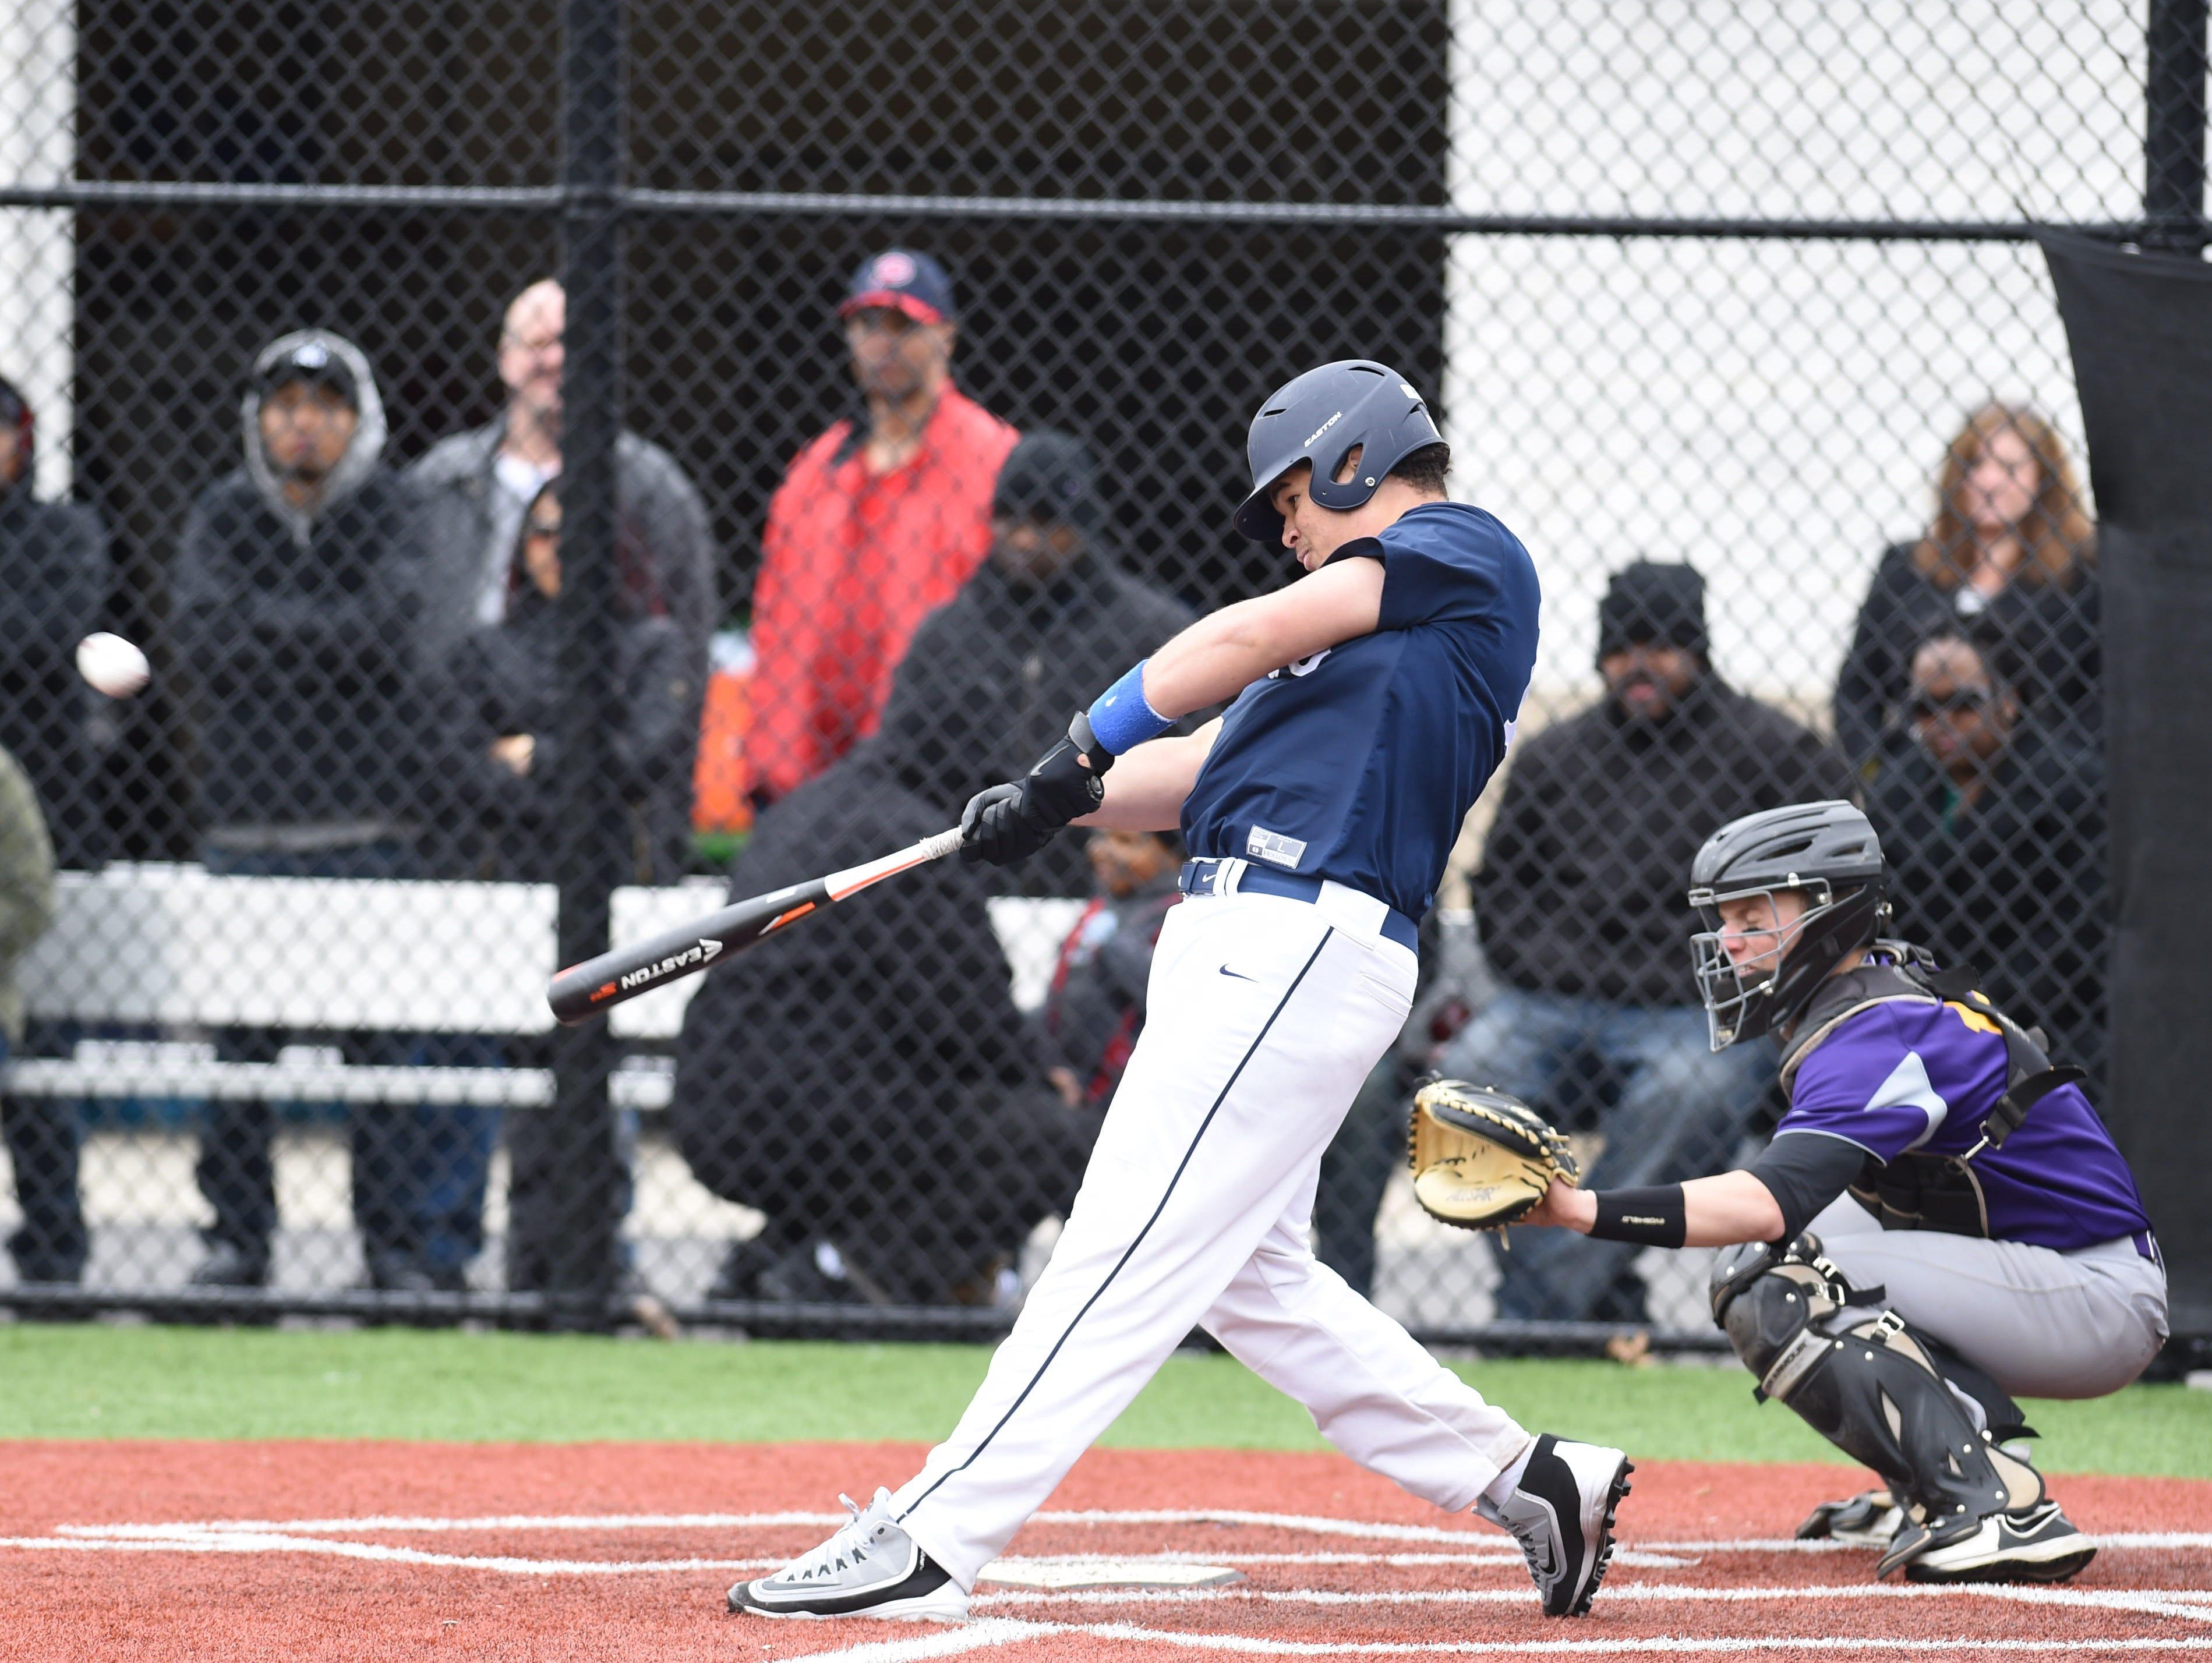 Poughkeepsie's Steven Disla hits during Saturday's game versus Rhinebeck at Poughkeepsie High School.